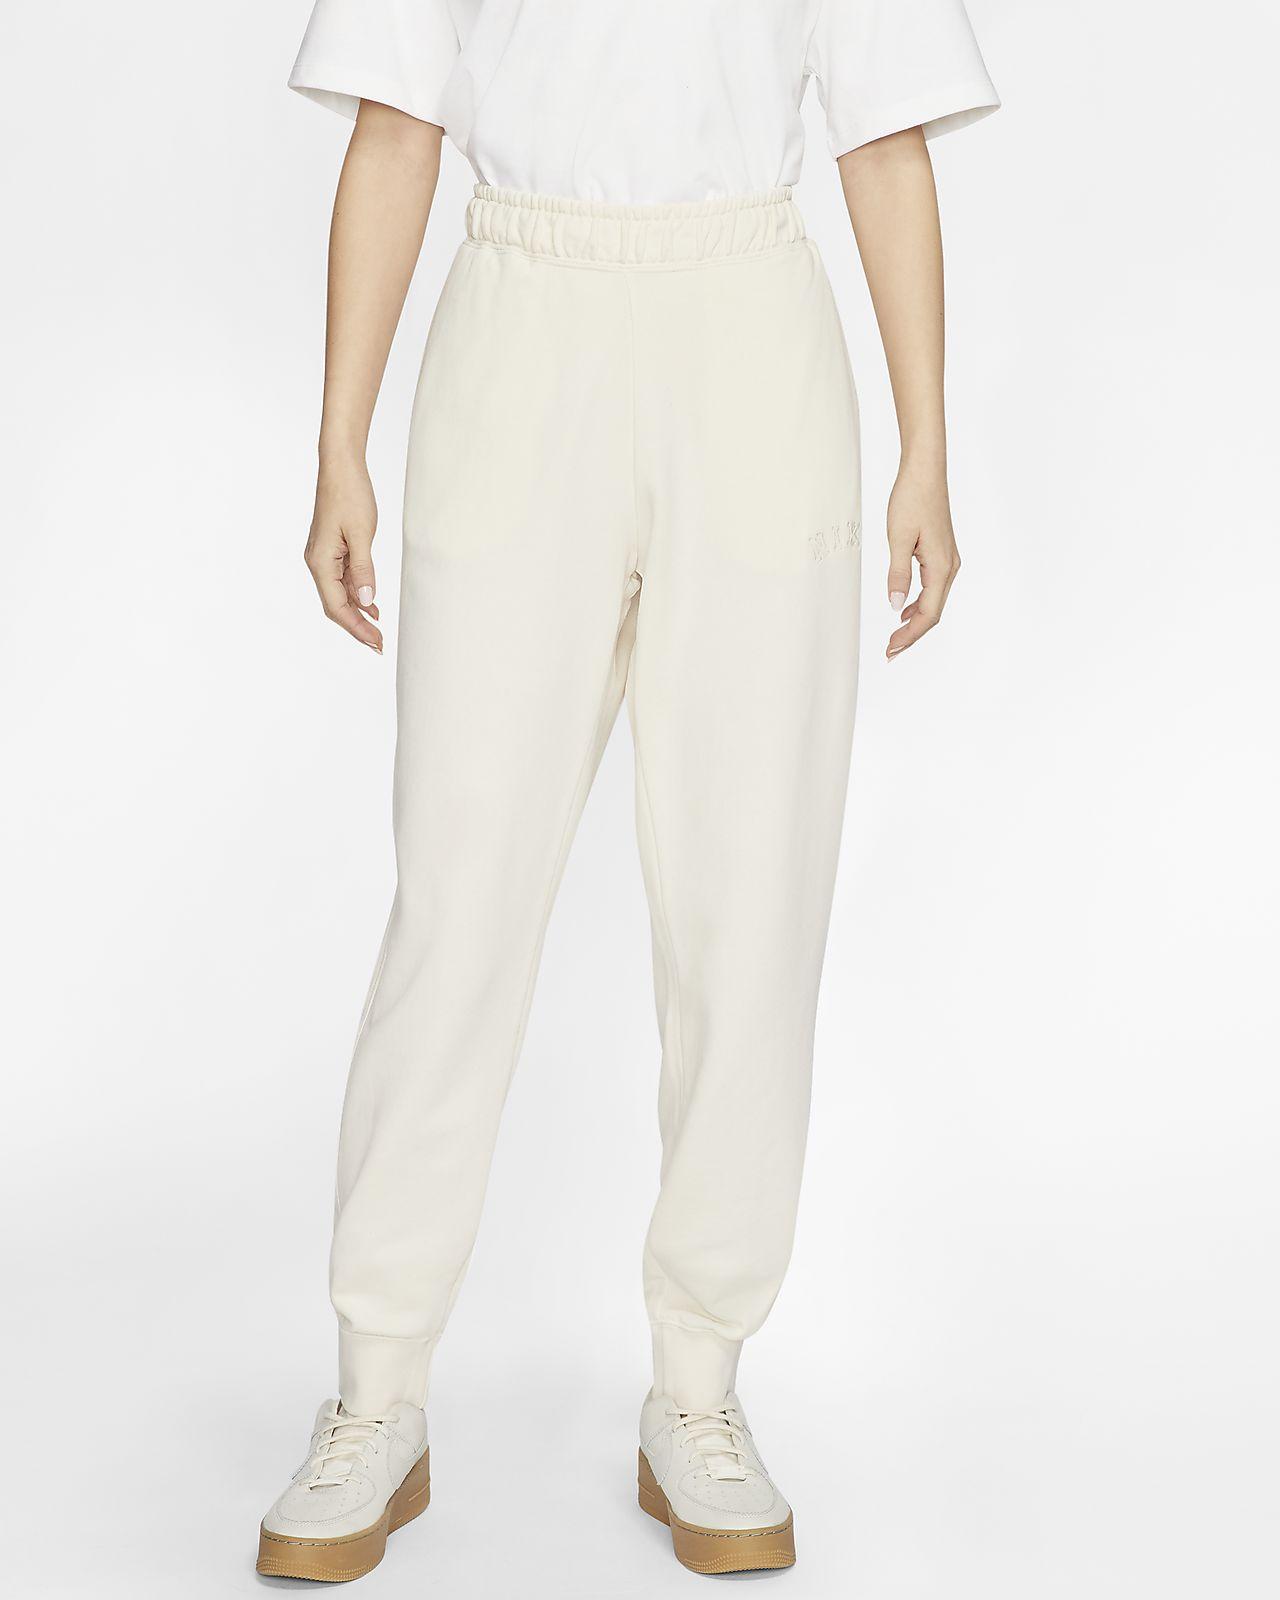 Nike Sportswear Damenhose aus French-Terry